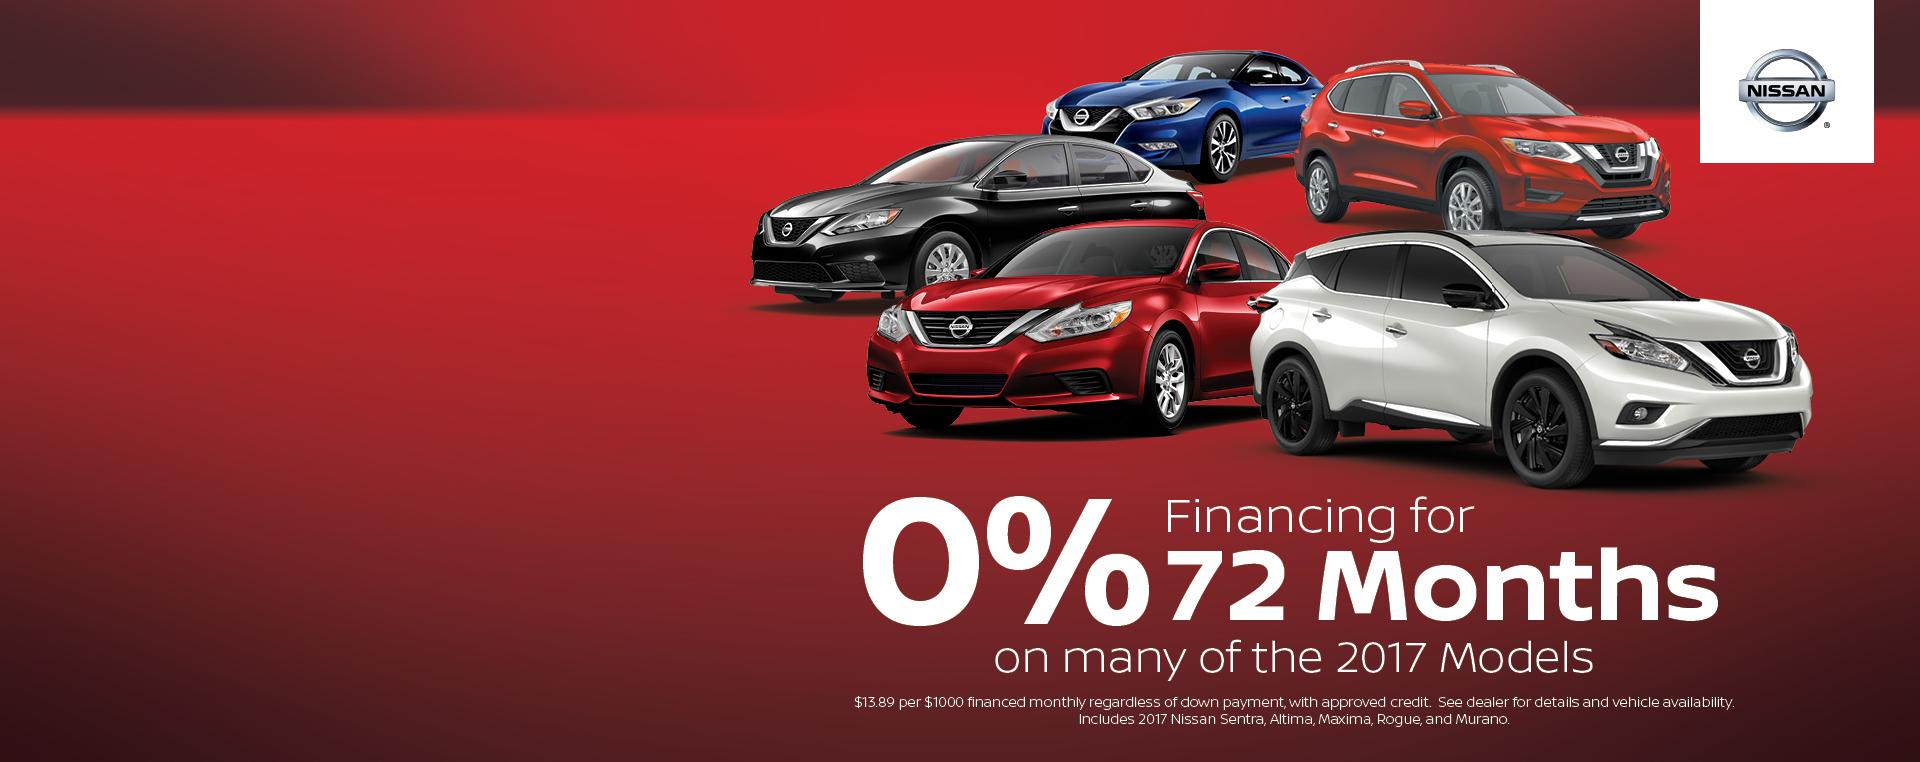 Nissan Dealership Indianapolis >> Schedule Service Hubler Nissan | Autos Post